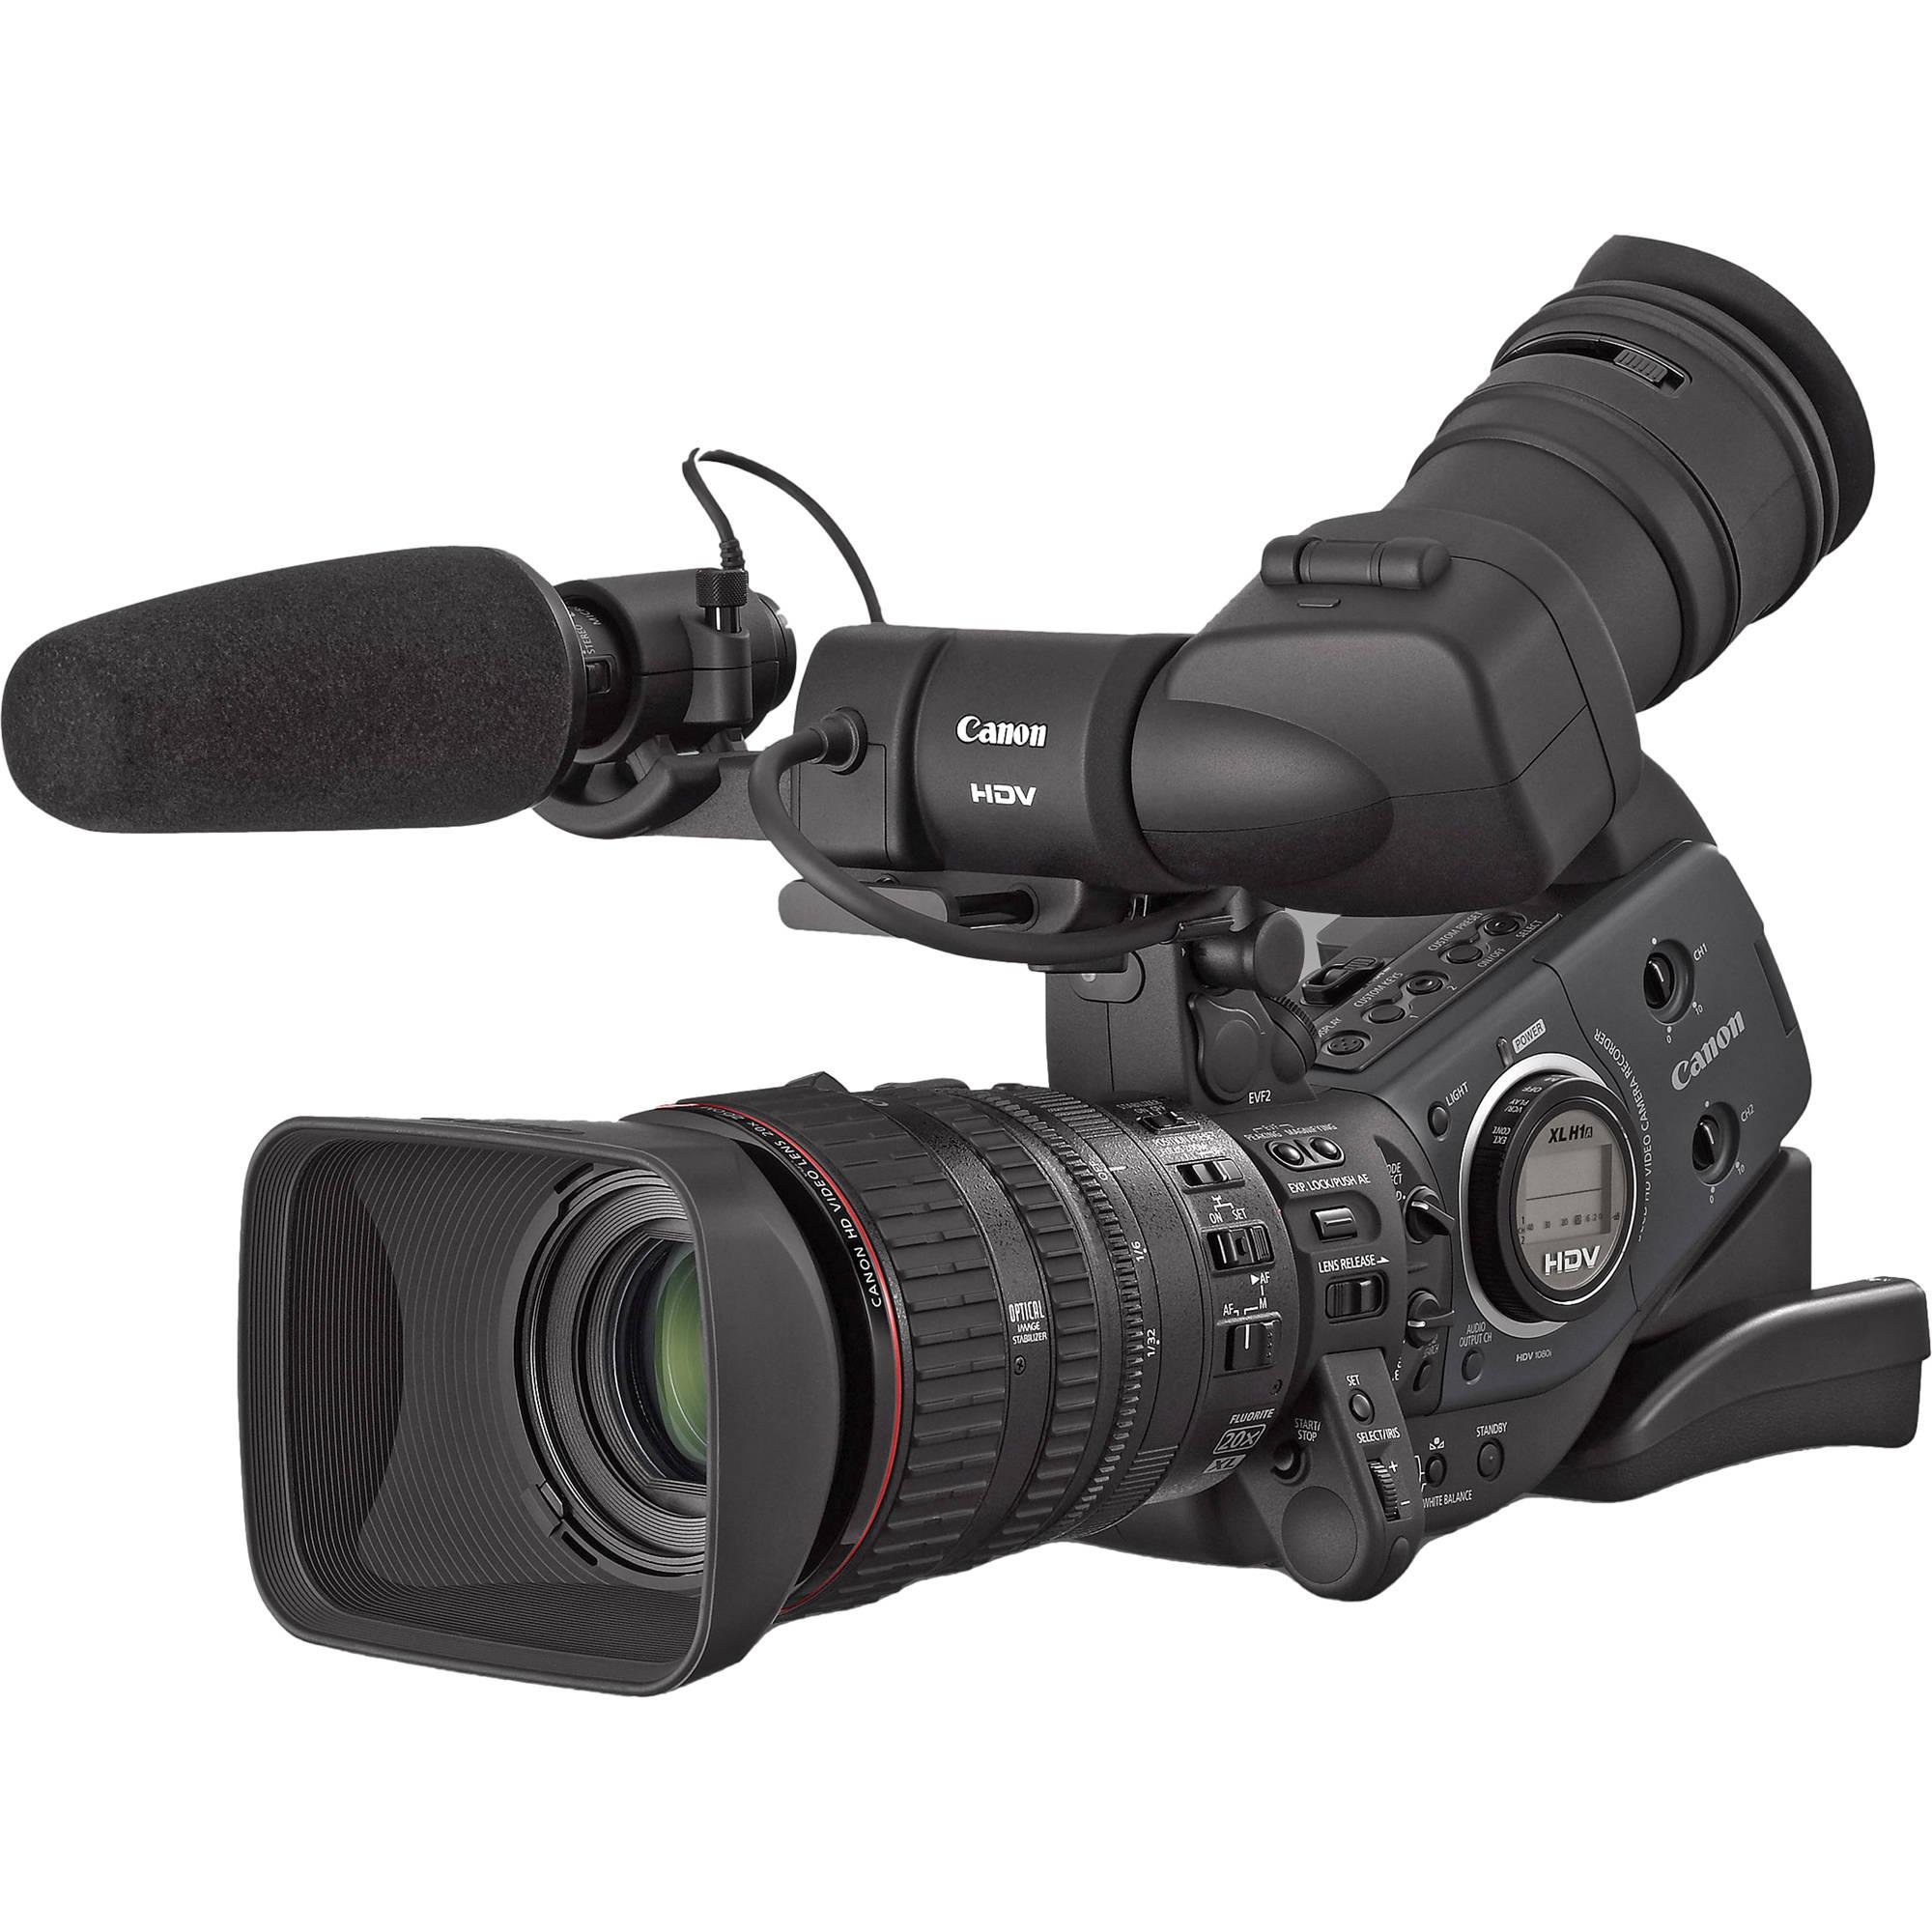 canon xl h1a 3 ccd high definition camcorder 3249b001 b h photo rh bhphotovideo com canon xl h1a manual pdf Canon XL Professional